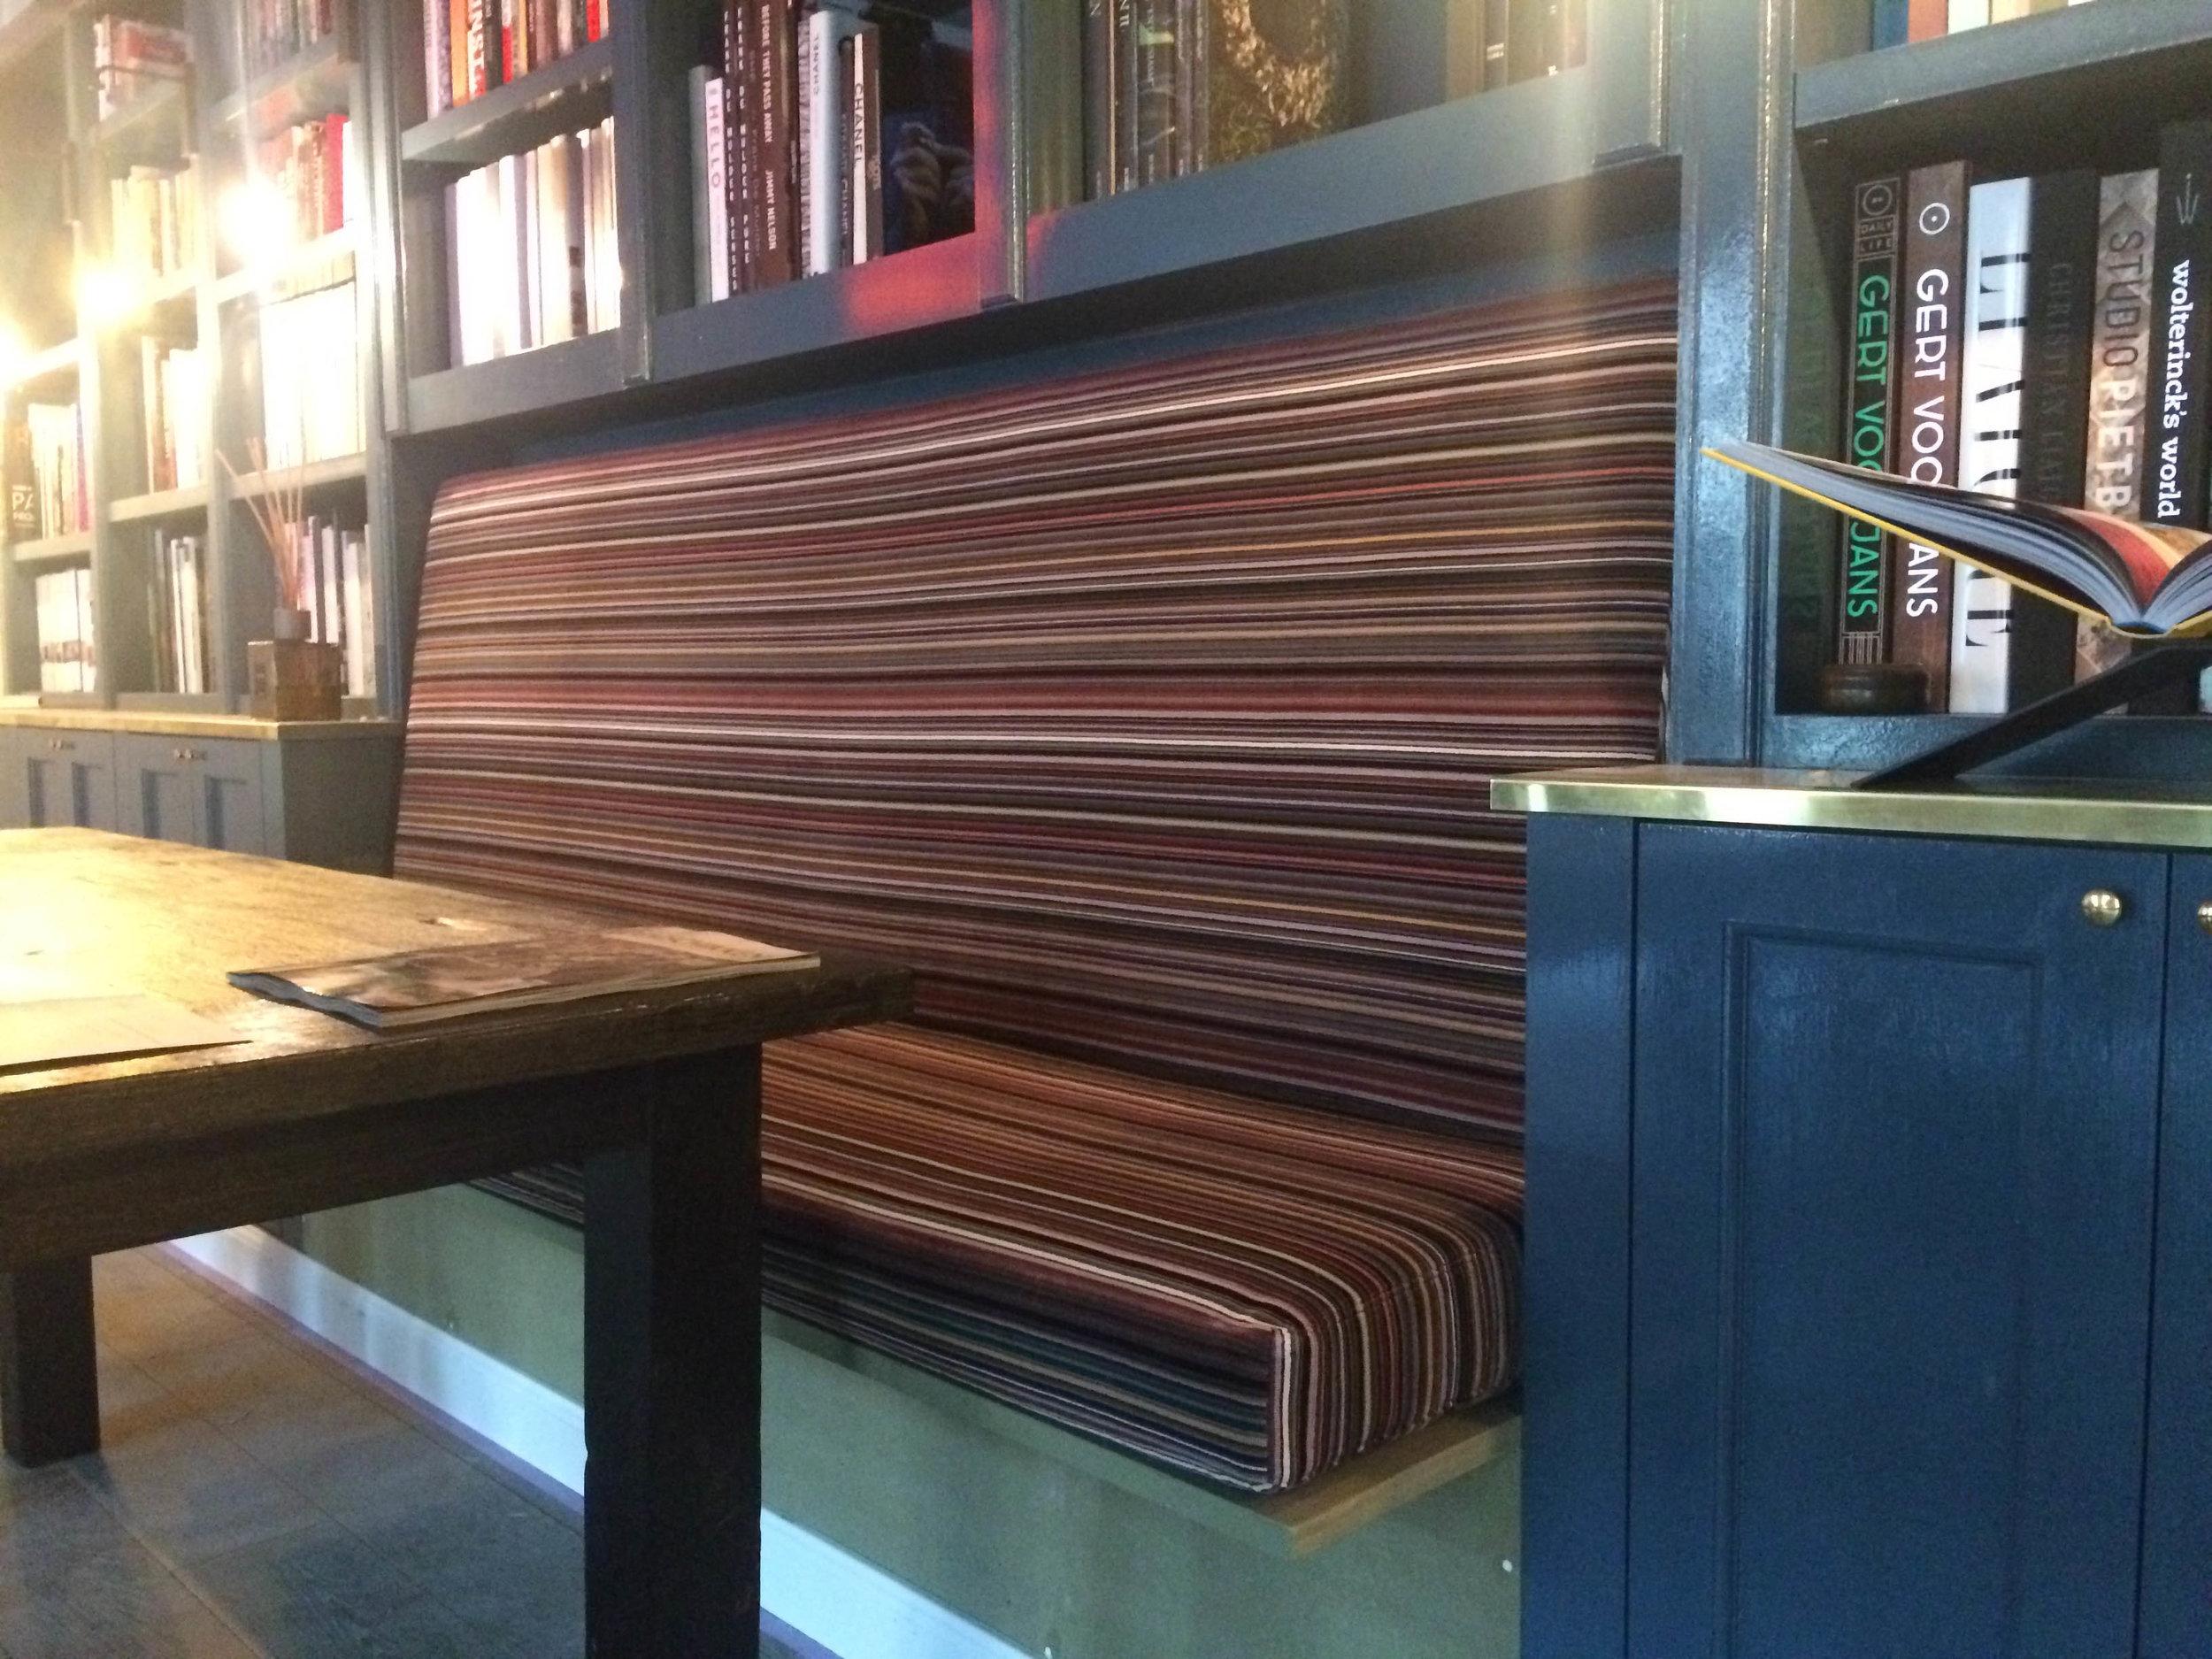 Bespoke library sofa, 2018, Belgium